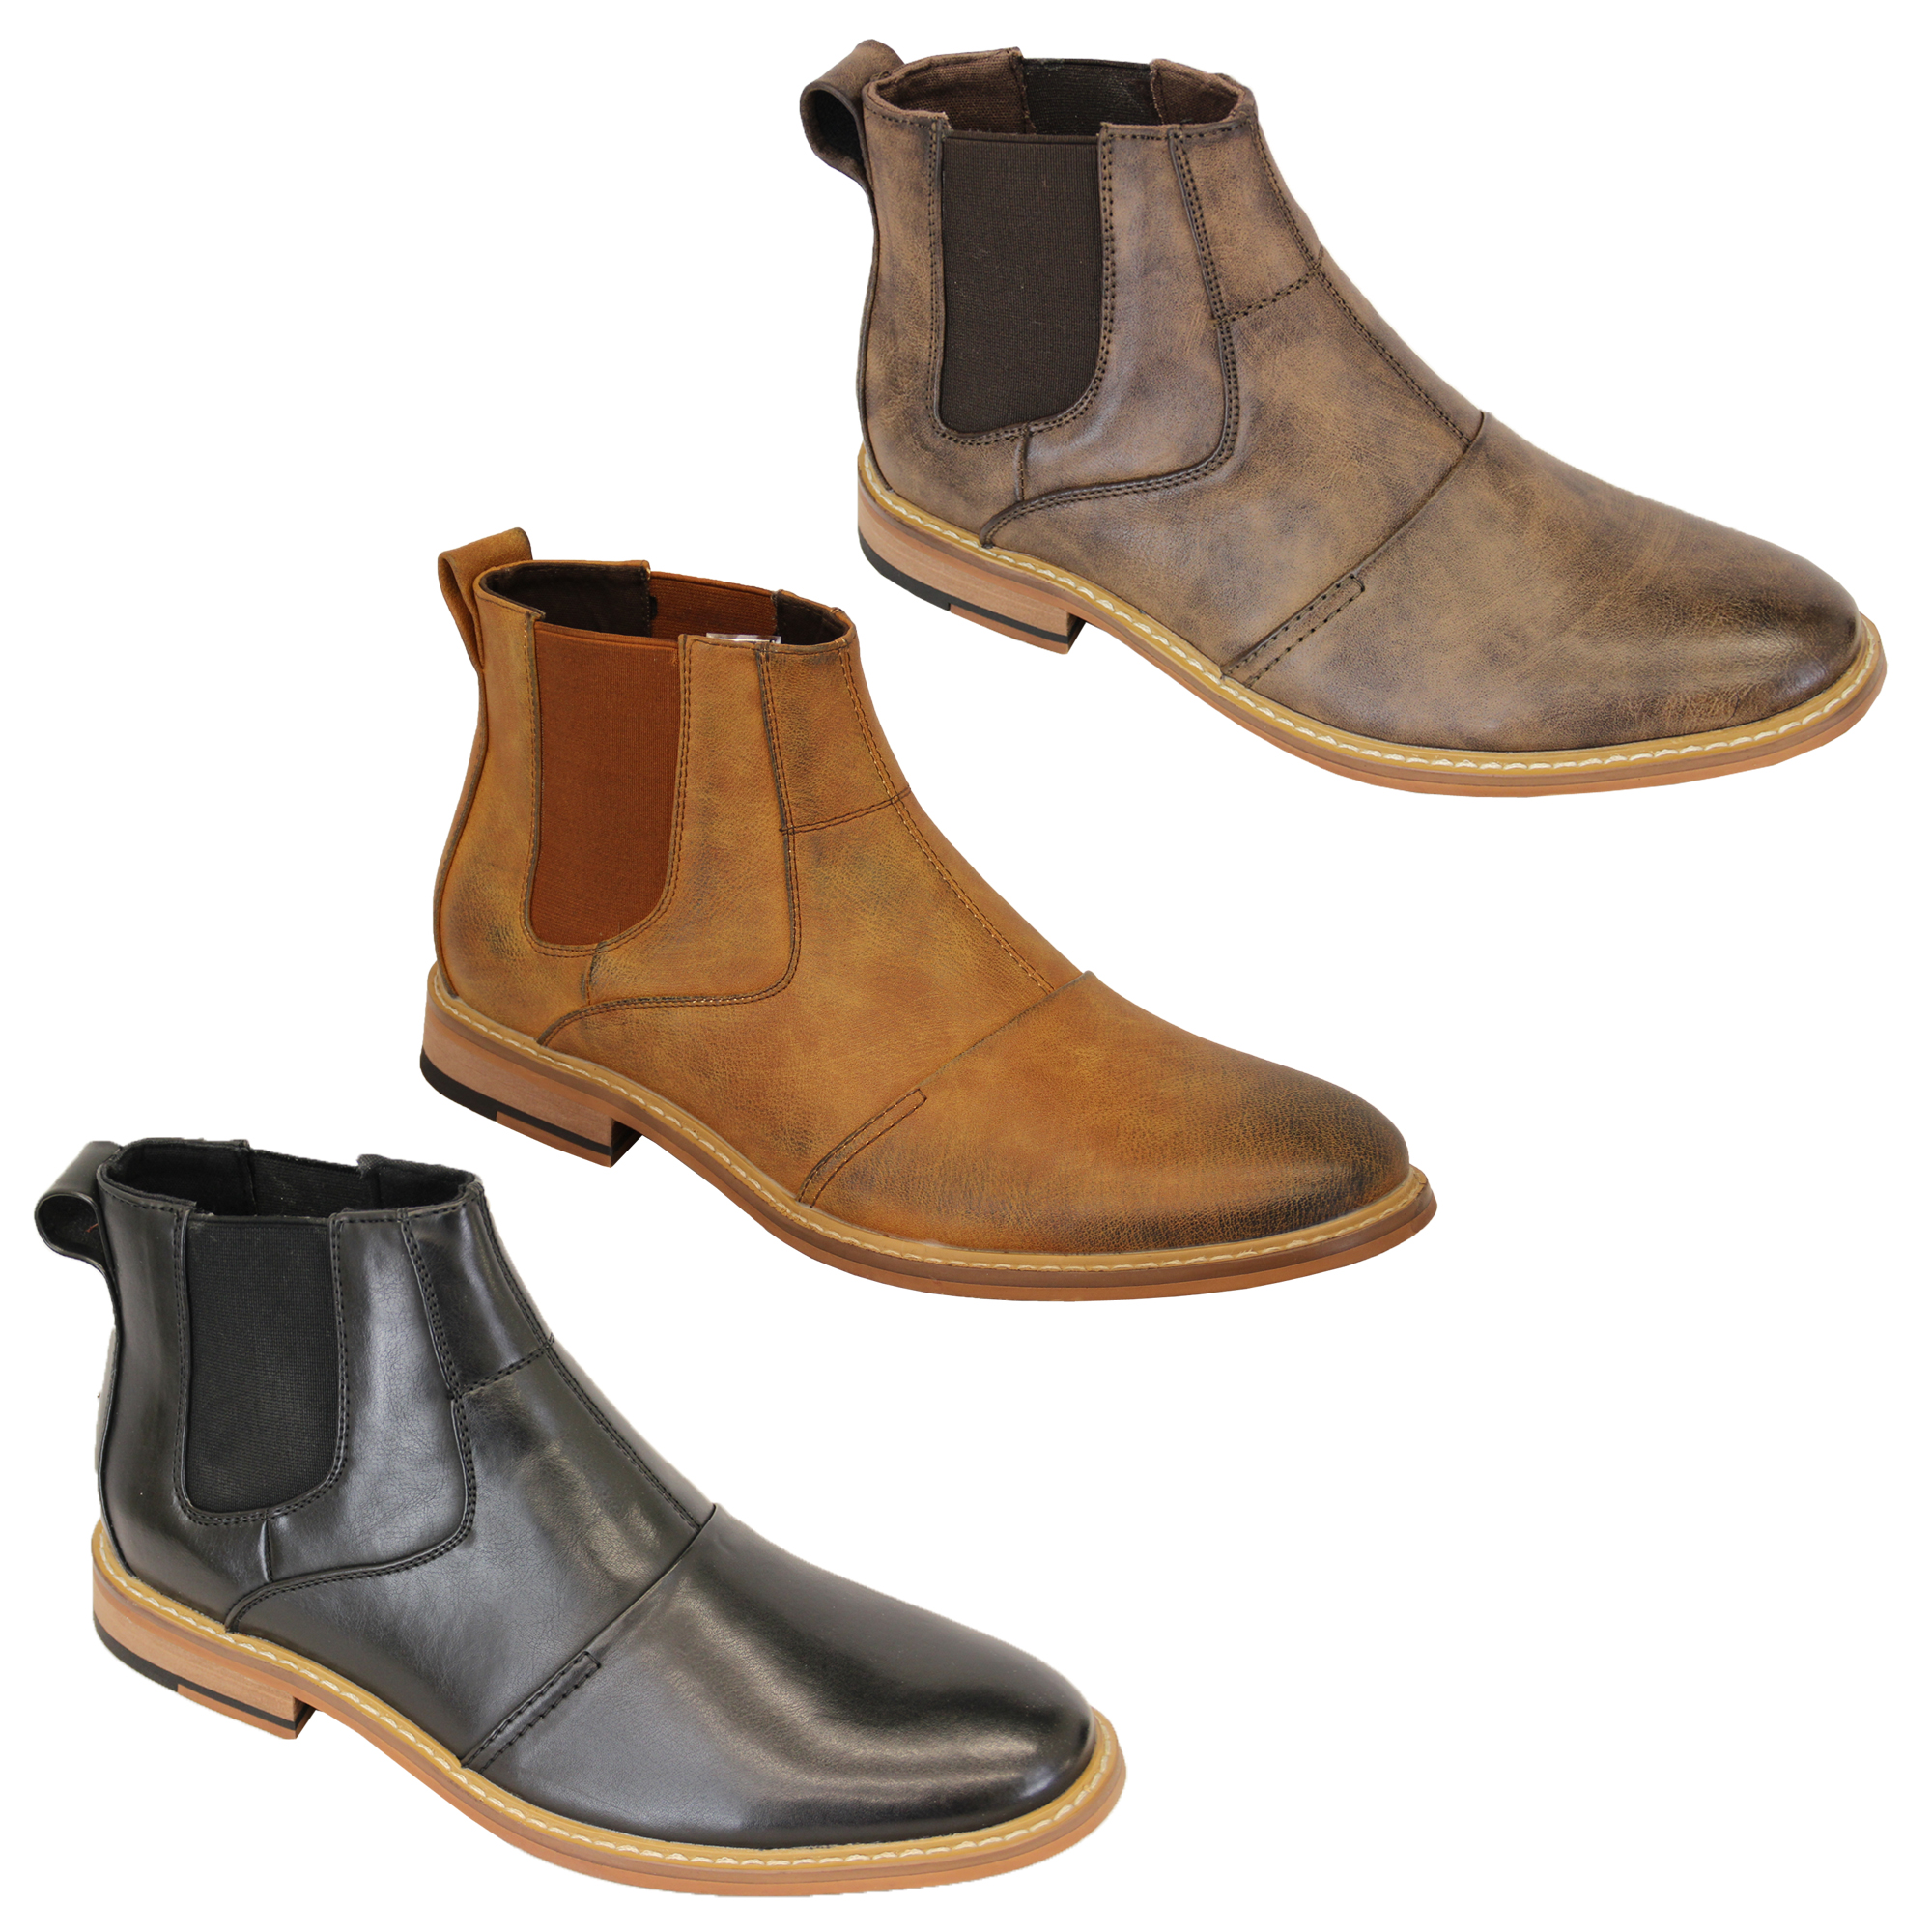 mens cavani boots chelsea dealer shoes high ankle leather